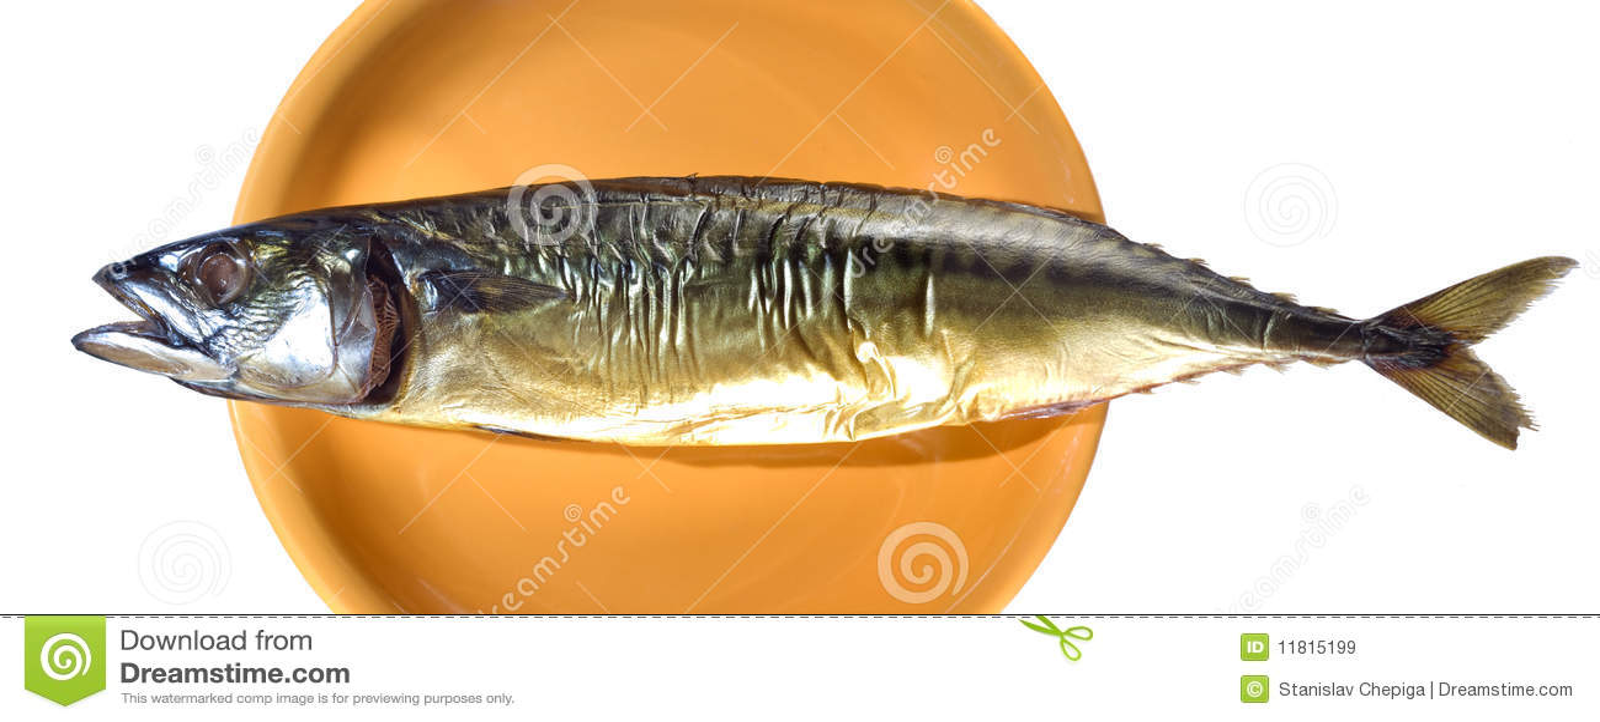 smoked fish business plan